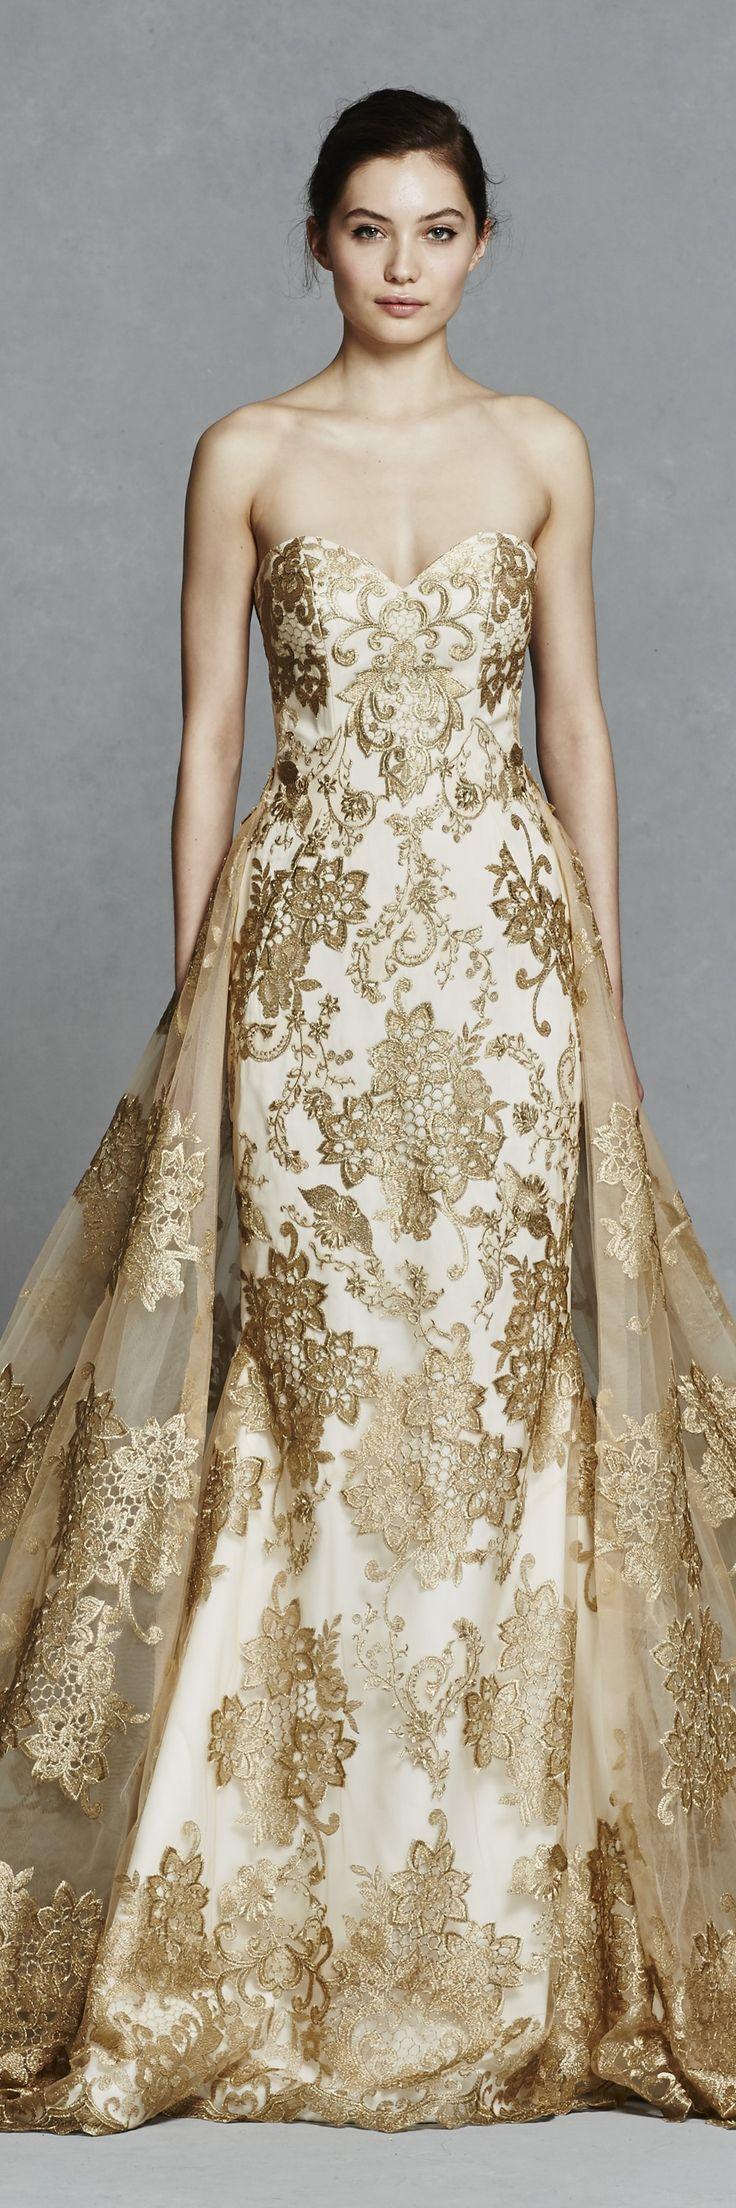 Gold sweetheart wedding dress #goldwedding @kellyfaetanini